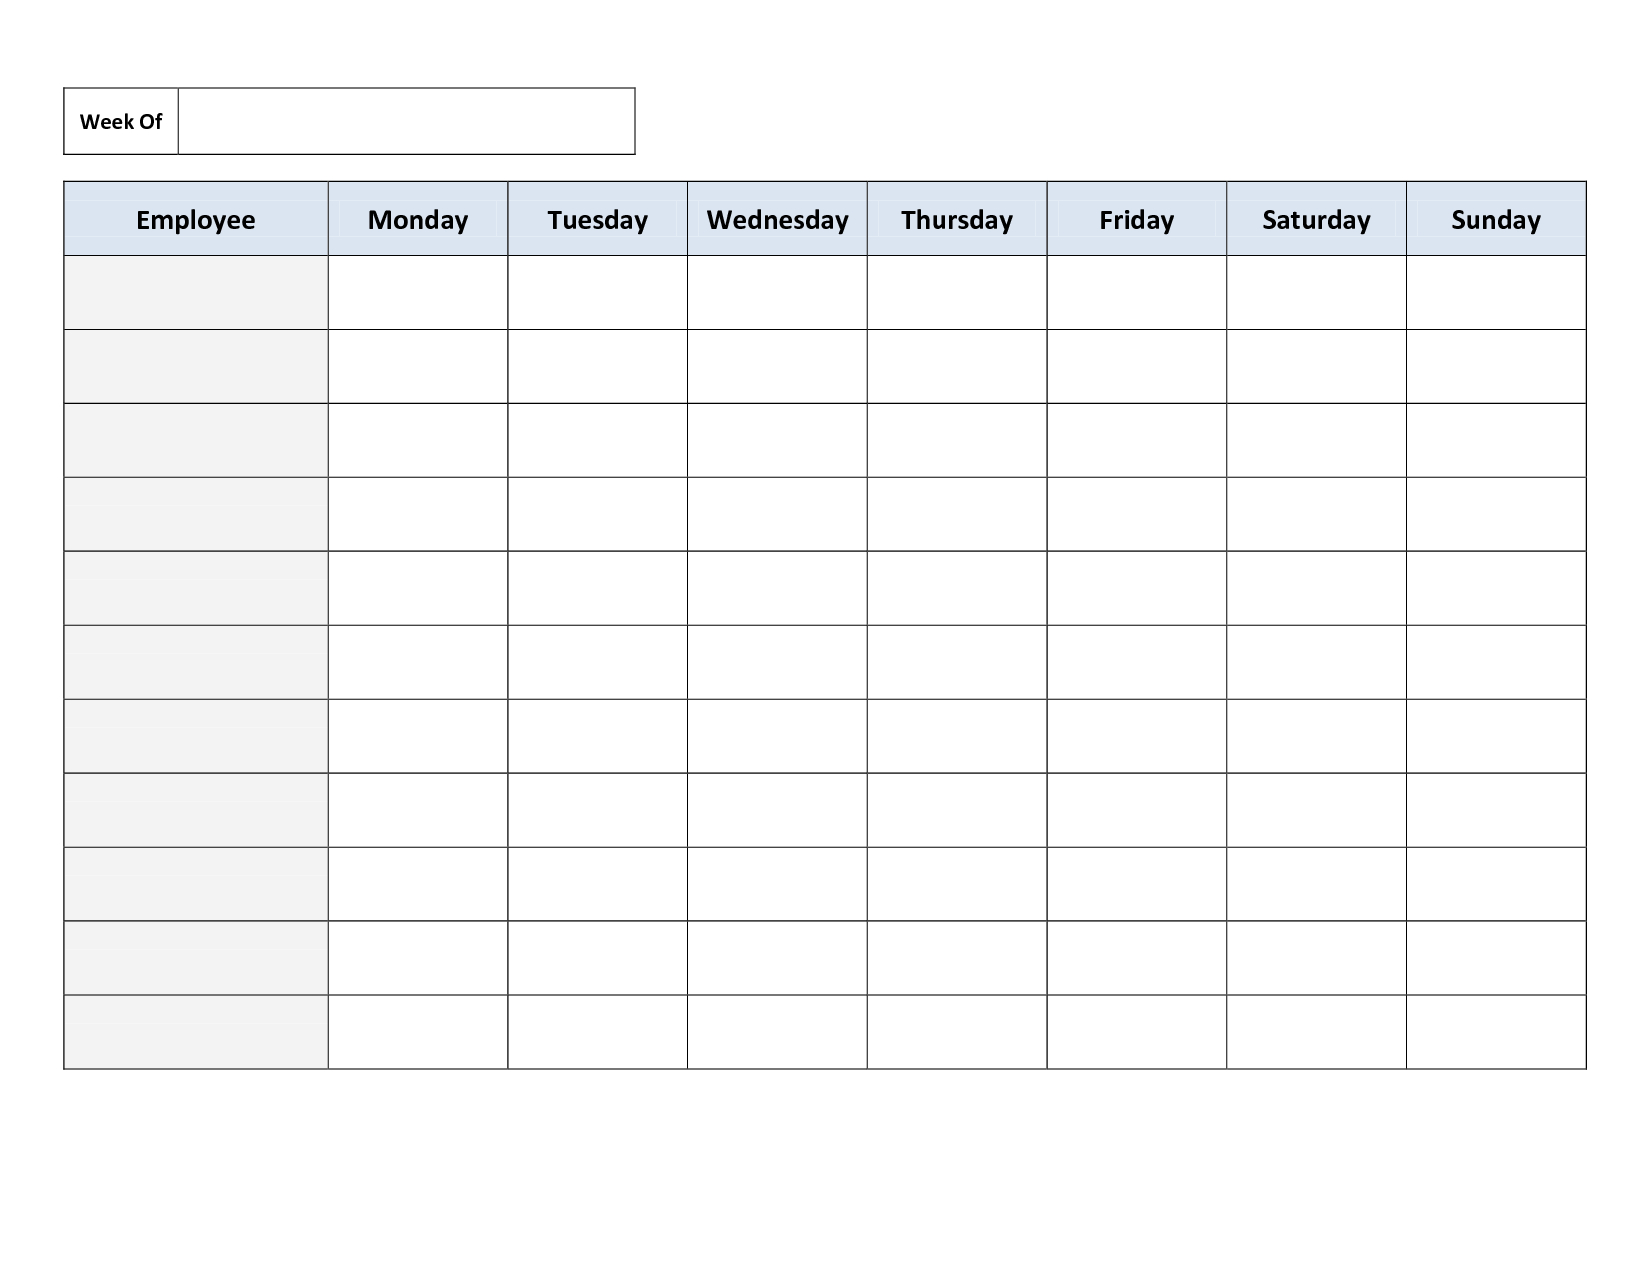 Blank Weekly Work Schedule Template | Schedule | Cleaning Schedule - Free Printable Weekly Work Schedule